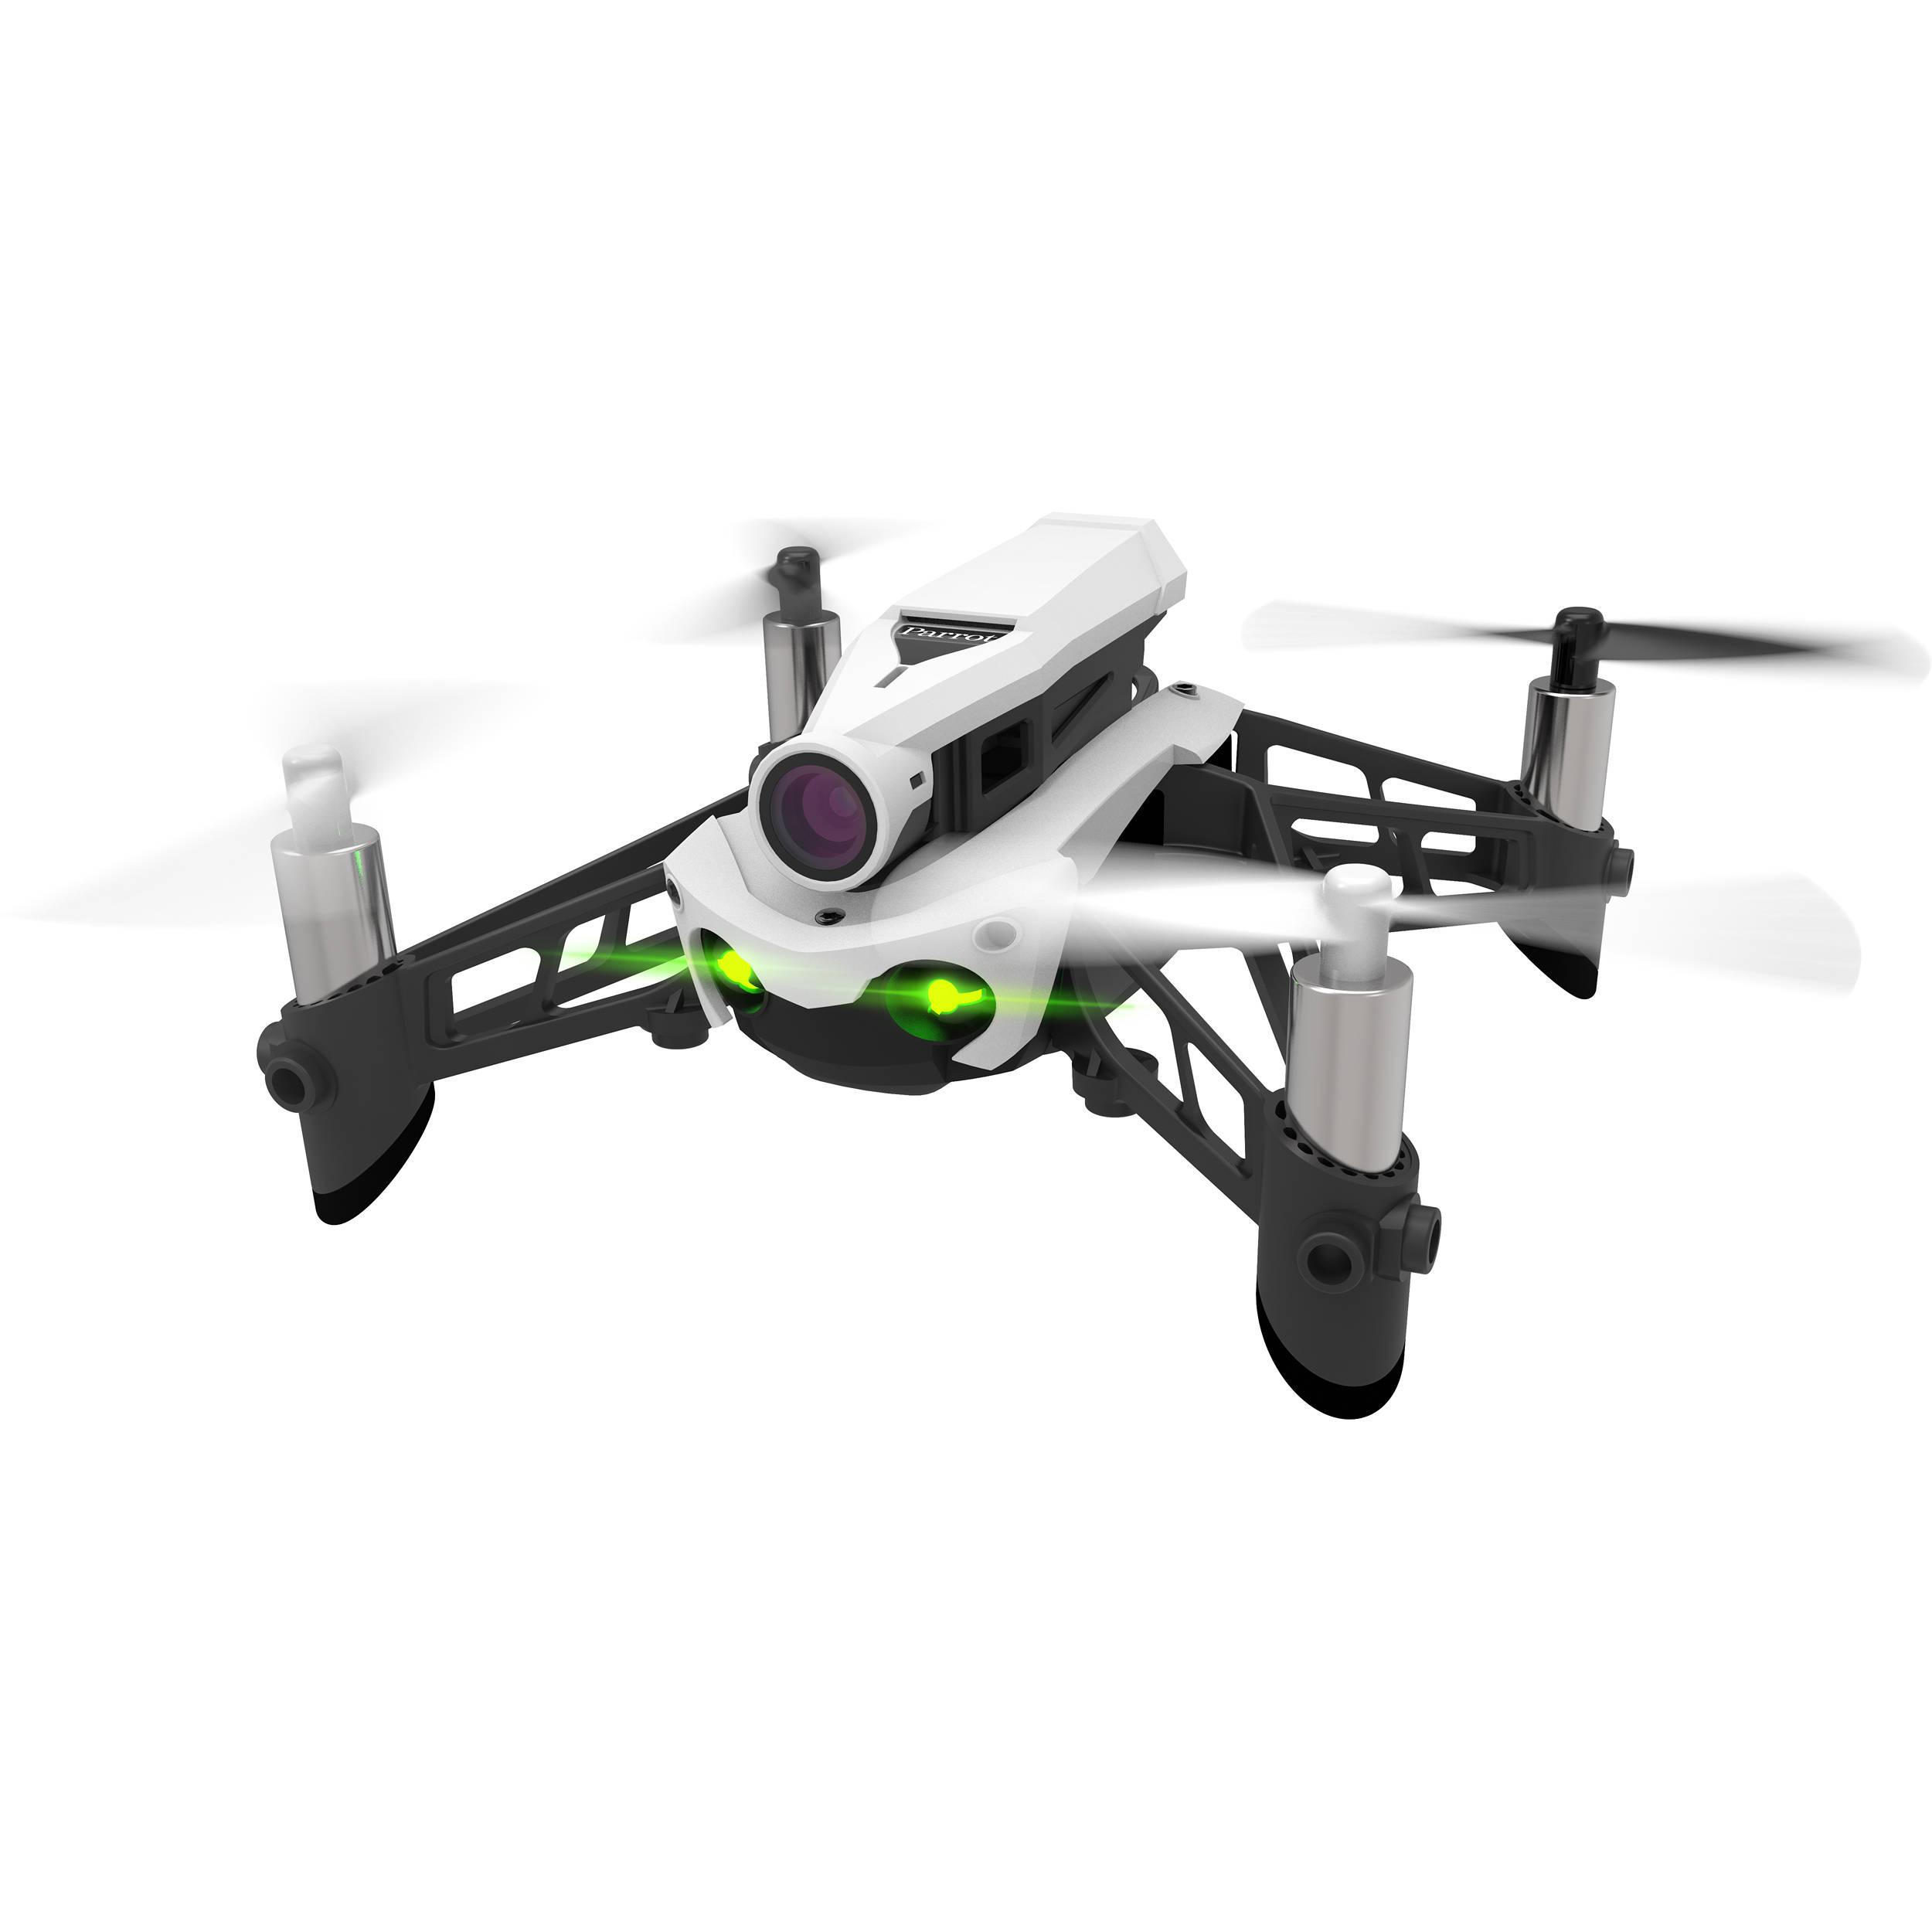 Parrot Mambo FPV Mini Quadcopter